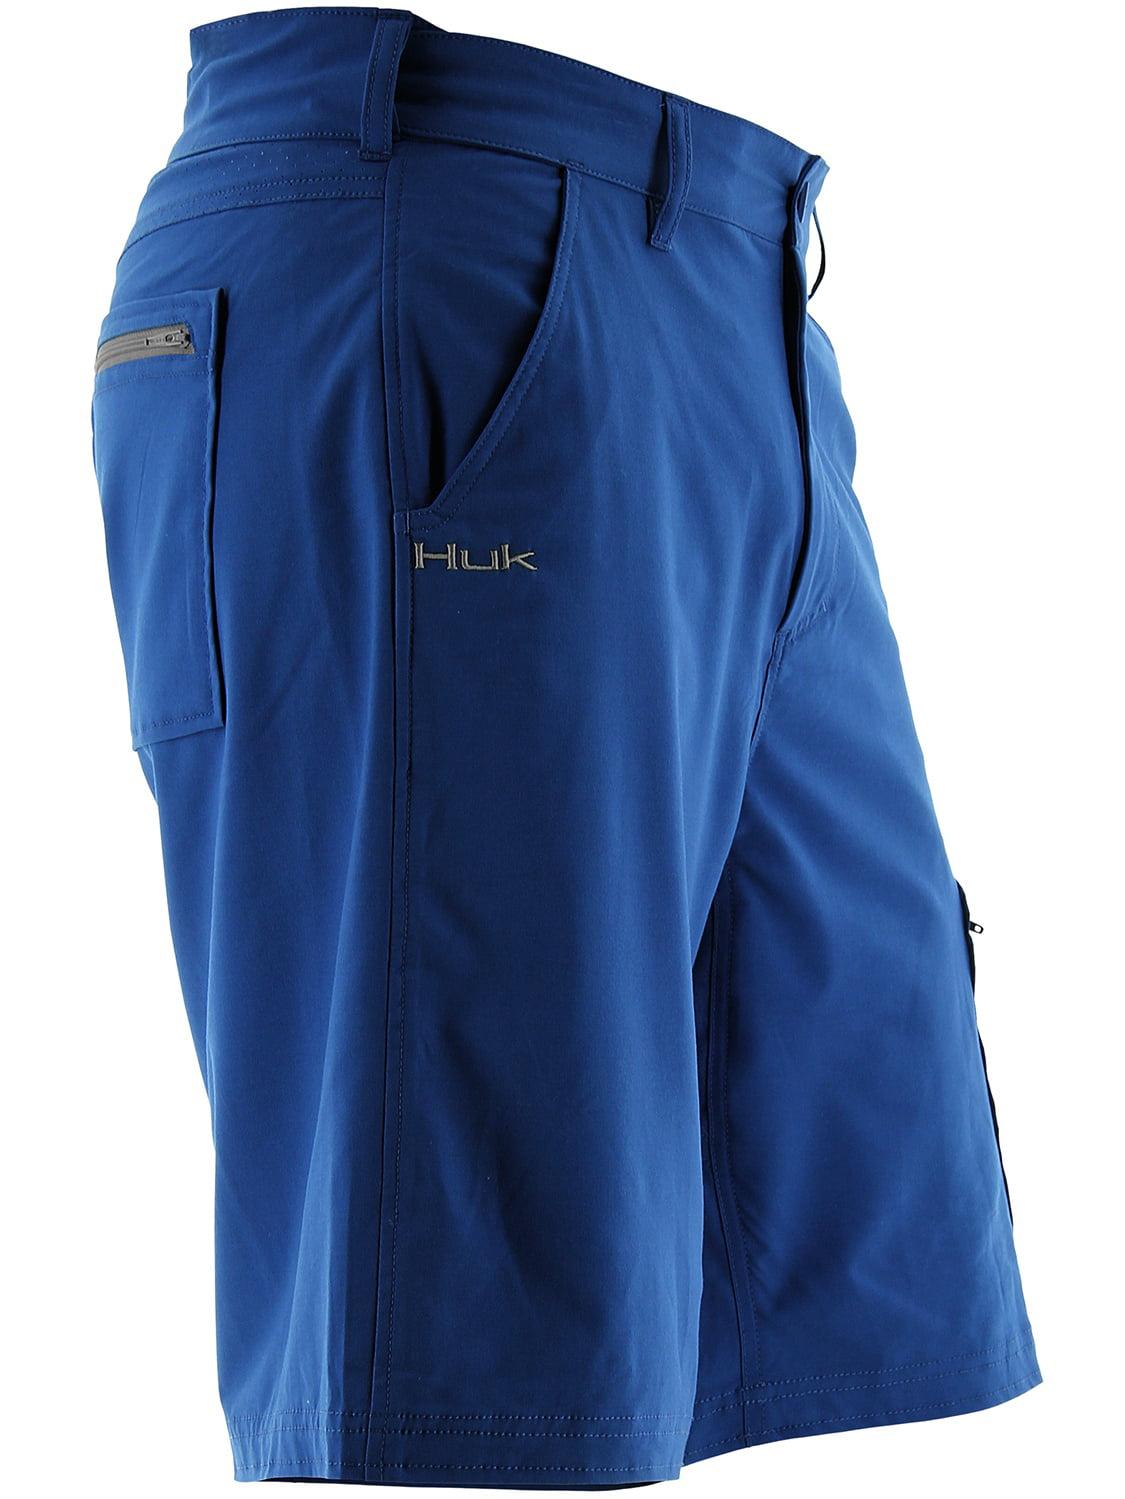 "Huk NXTLVL 10.5"" Short (Dark Blue, Large)"